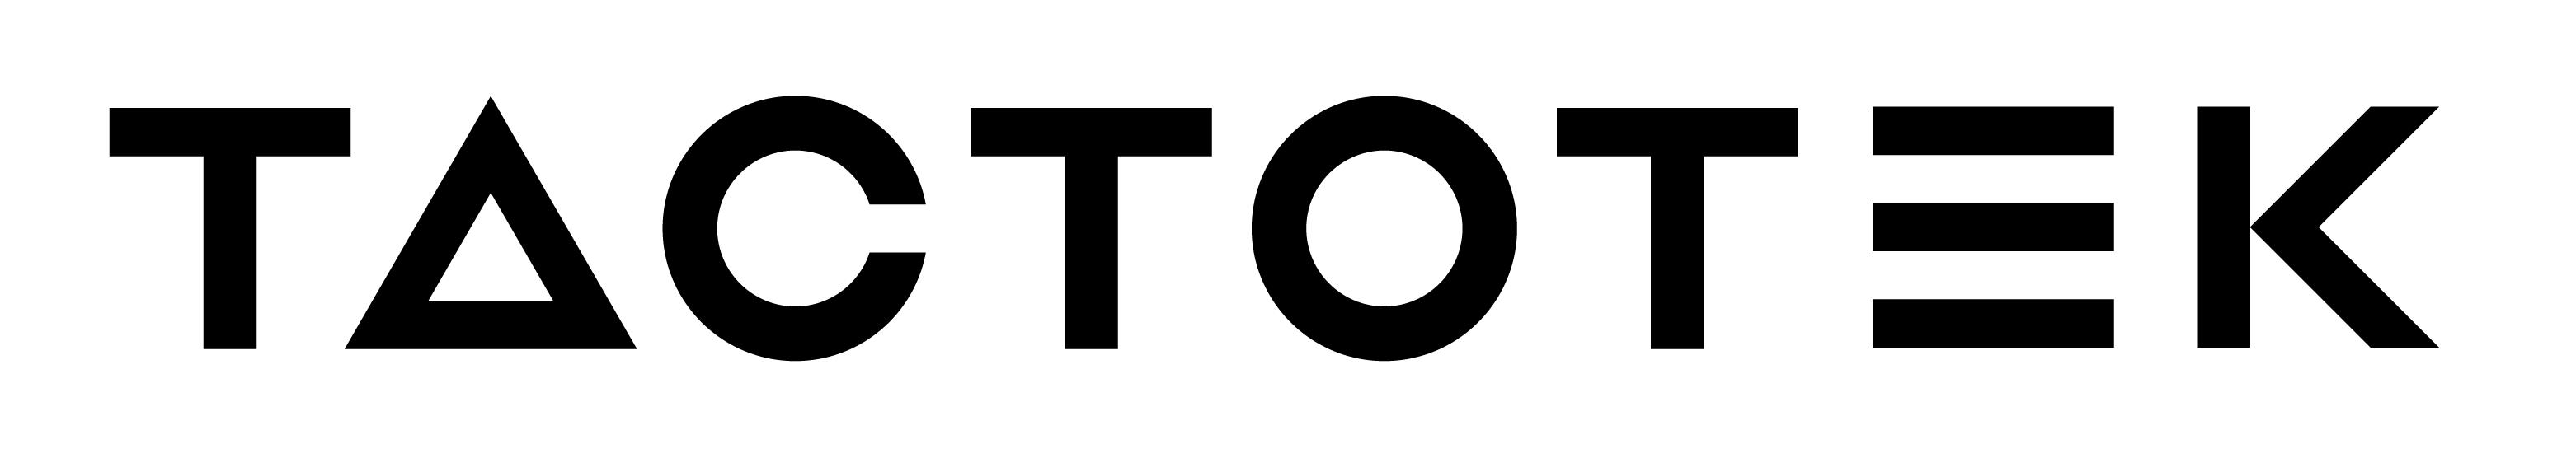 Nalin Advani, APAC Technology Business Leader, Joins TactoTek Advisory Board